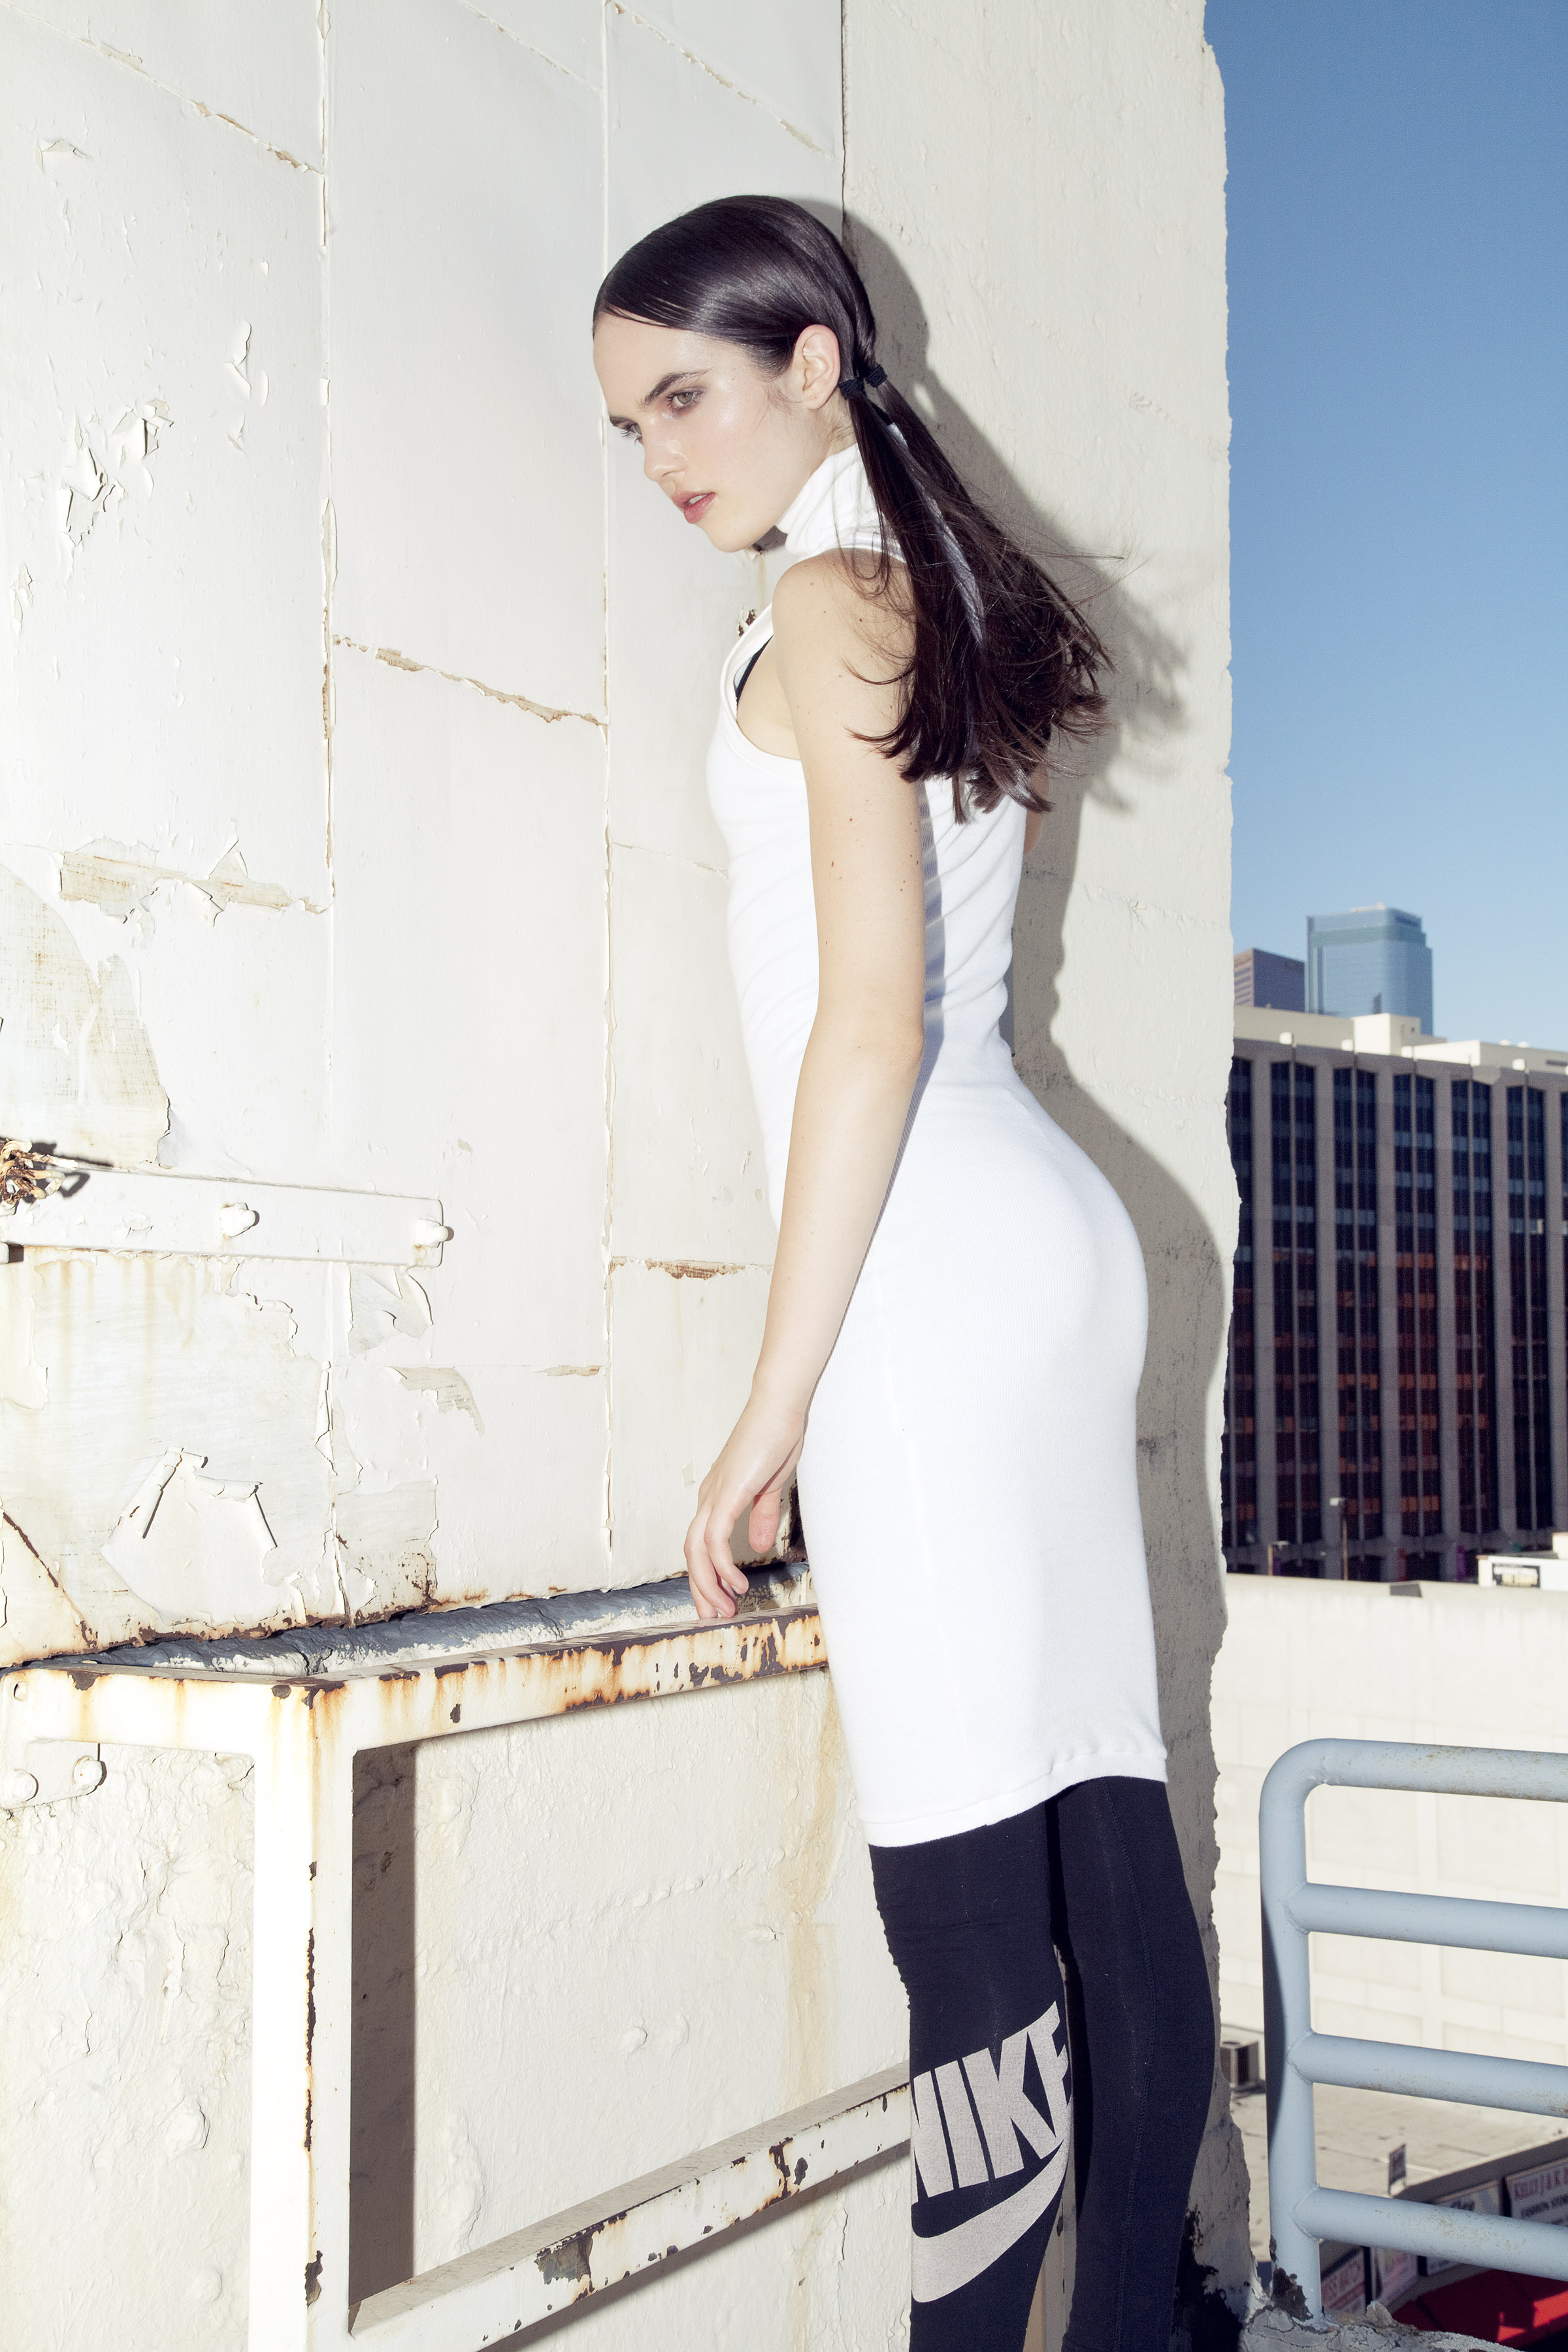 BRAZEN for Ladygunn Mag by Di Henri & styled by Keyla Marquez  (MOCK NECK RIB DRESS)